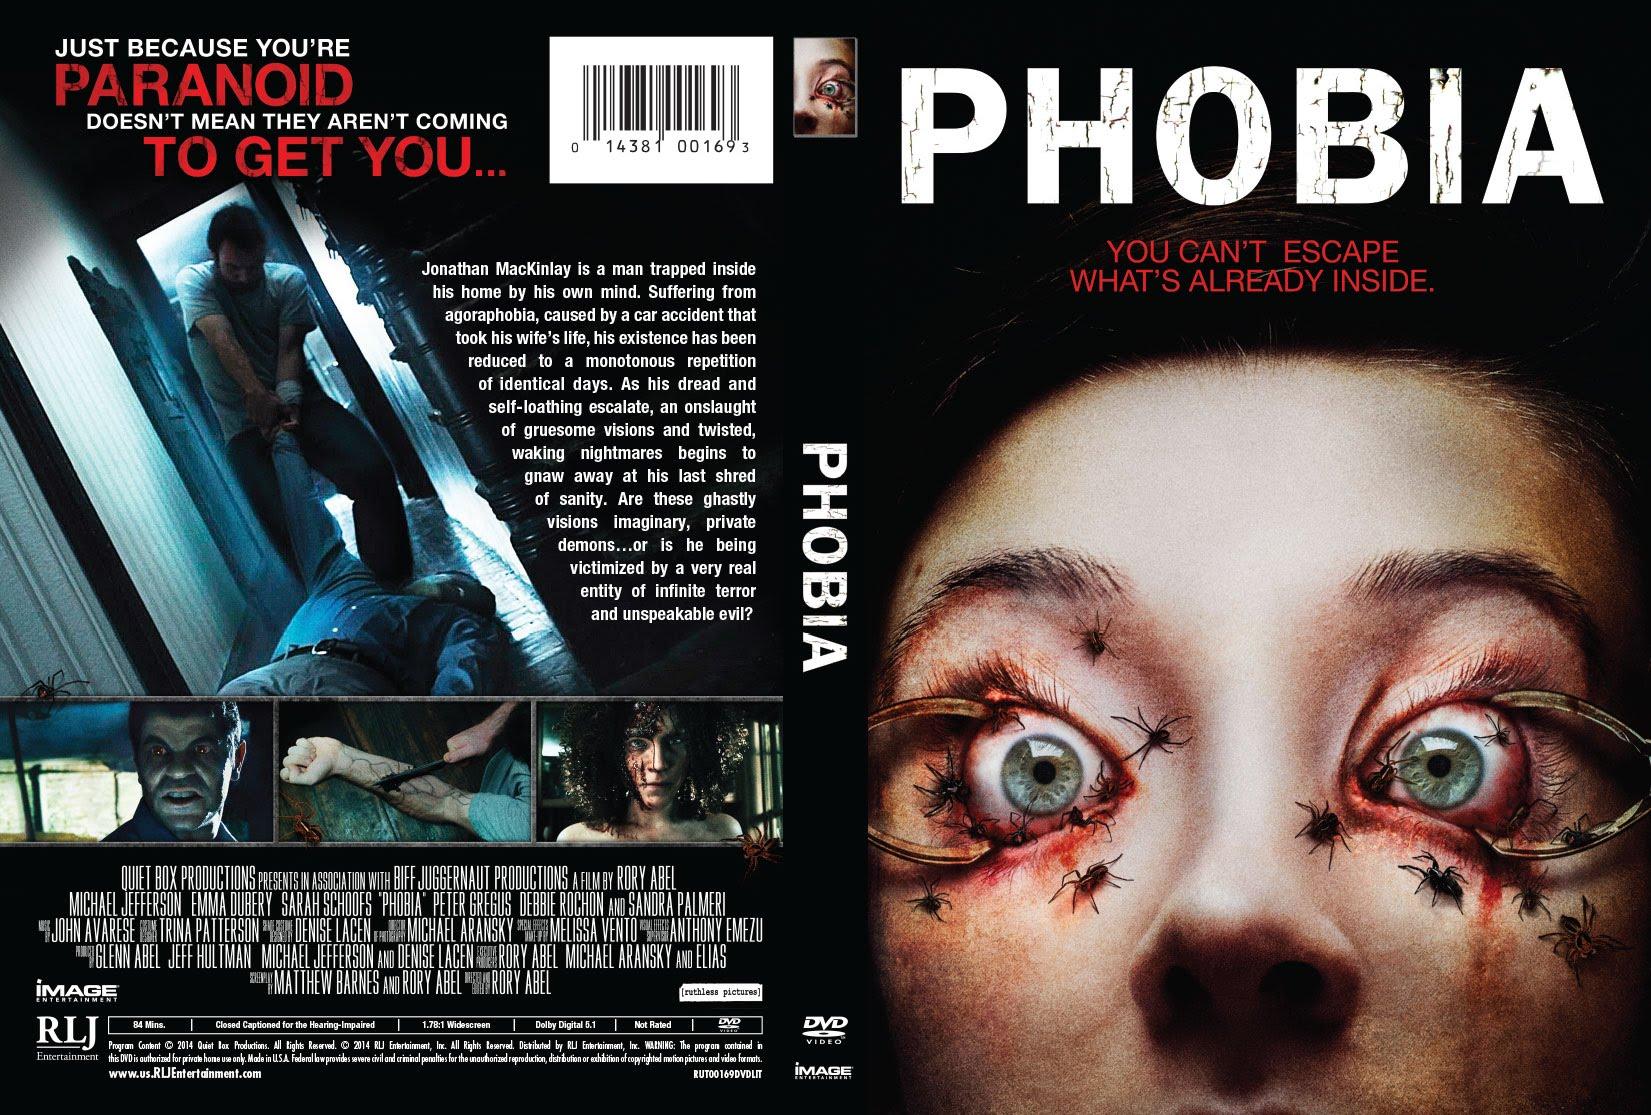 Phobia film poster